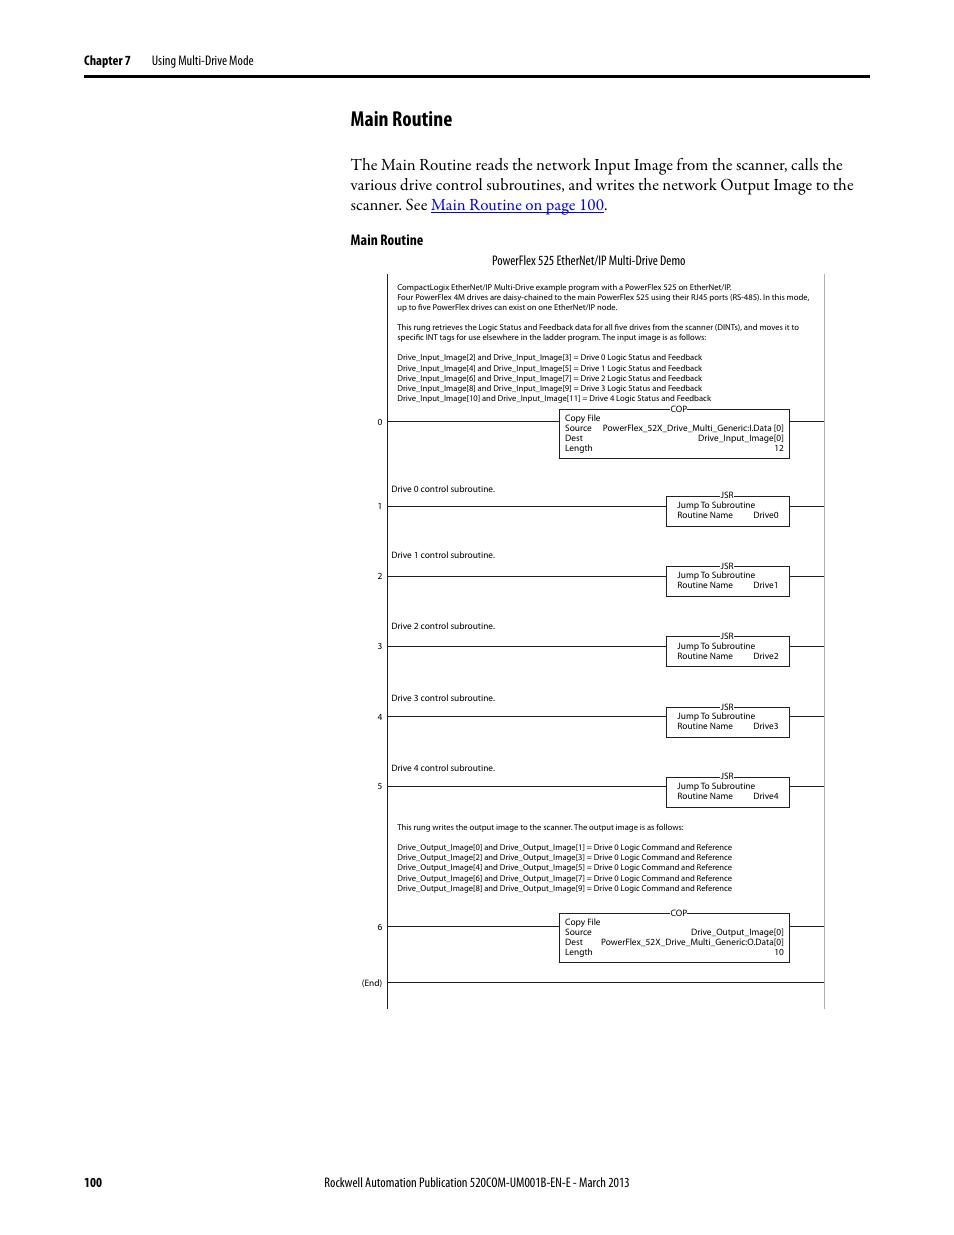 Main Routine Powerflex 525 Ethernet Ip Multi Manual Guide